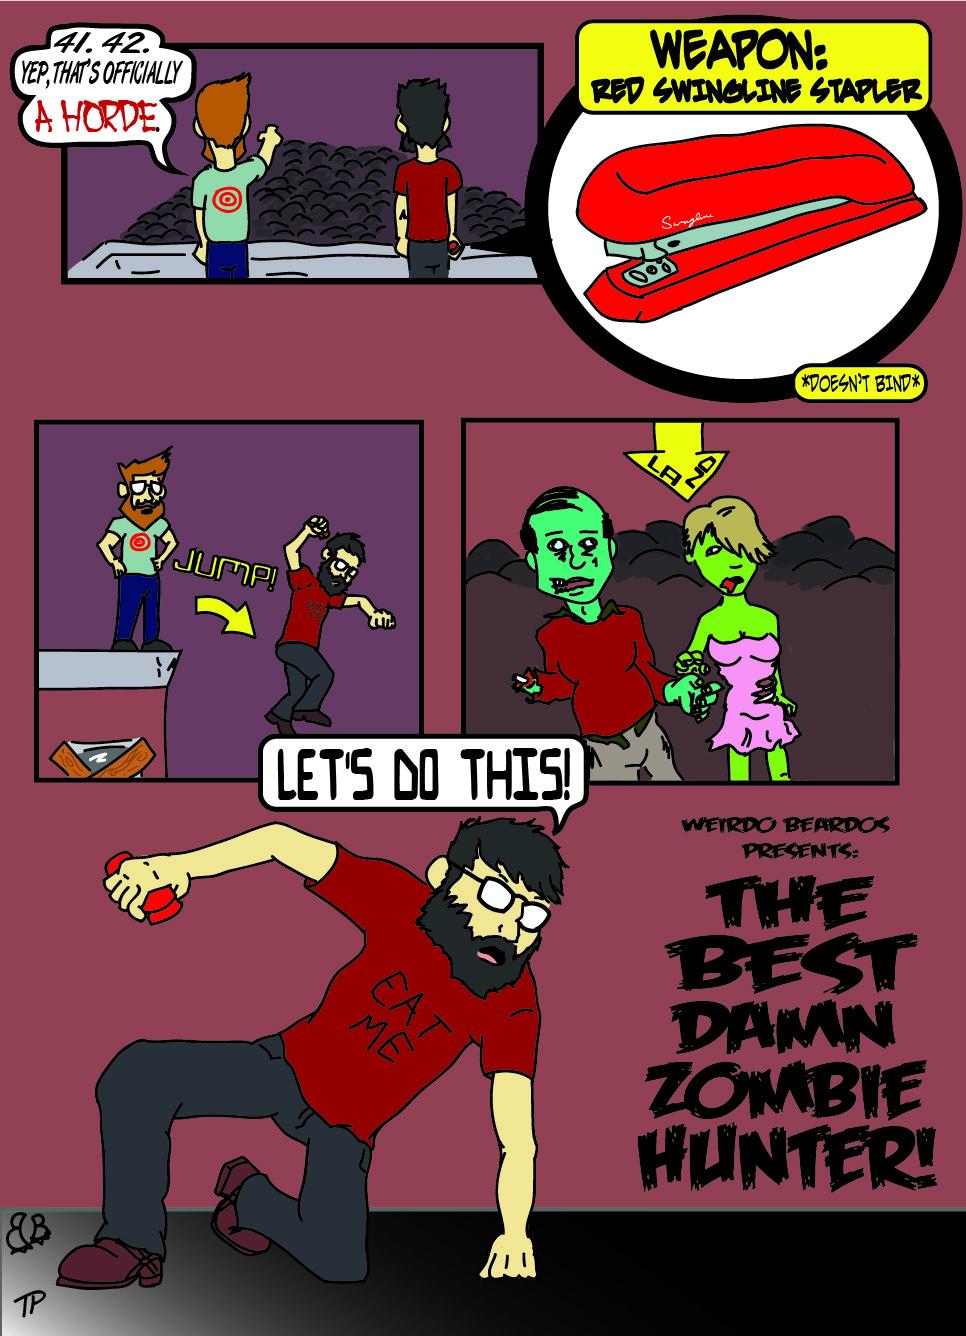 The Best Damn Zombie Hunter